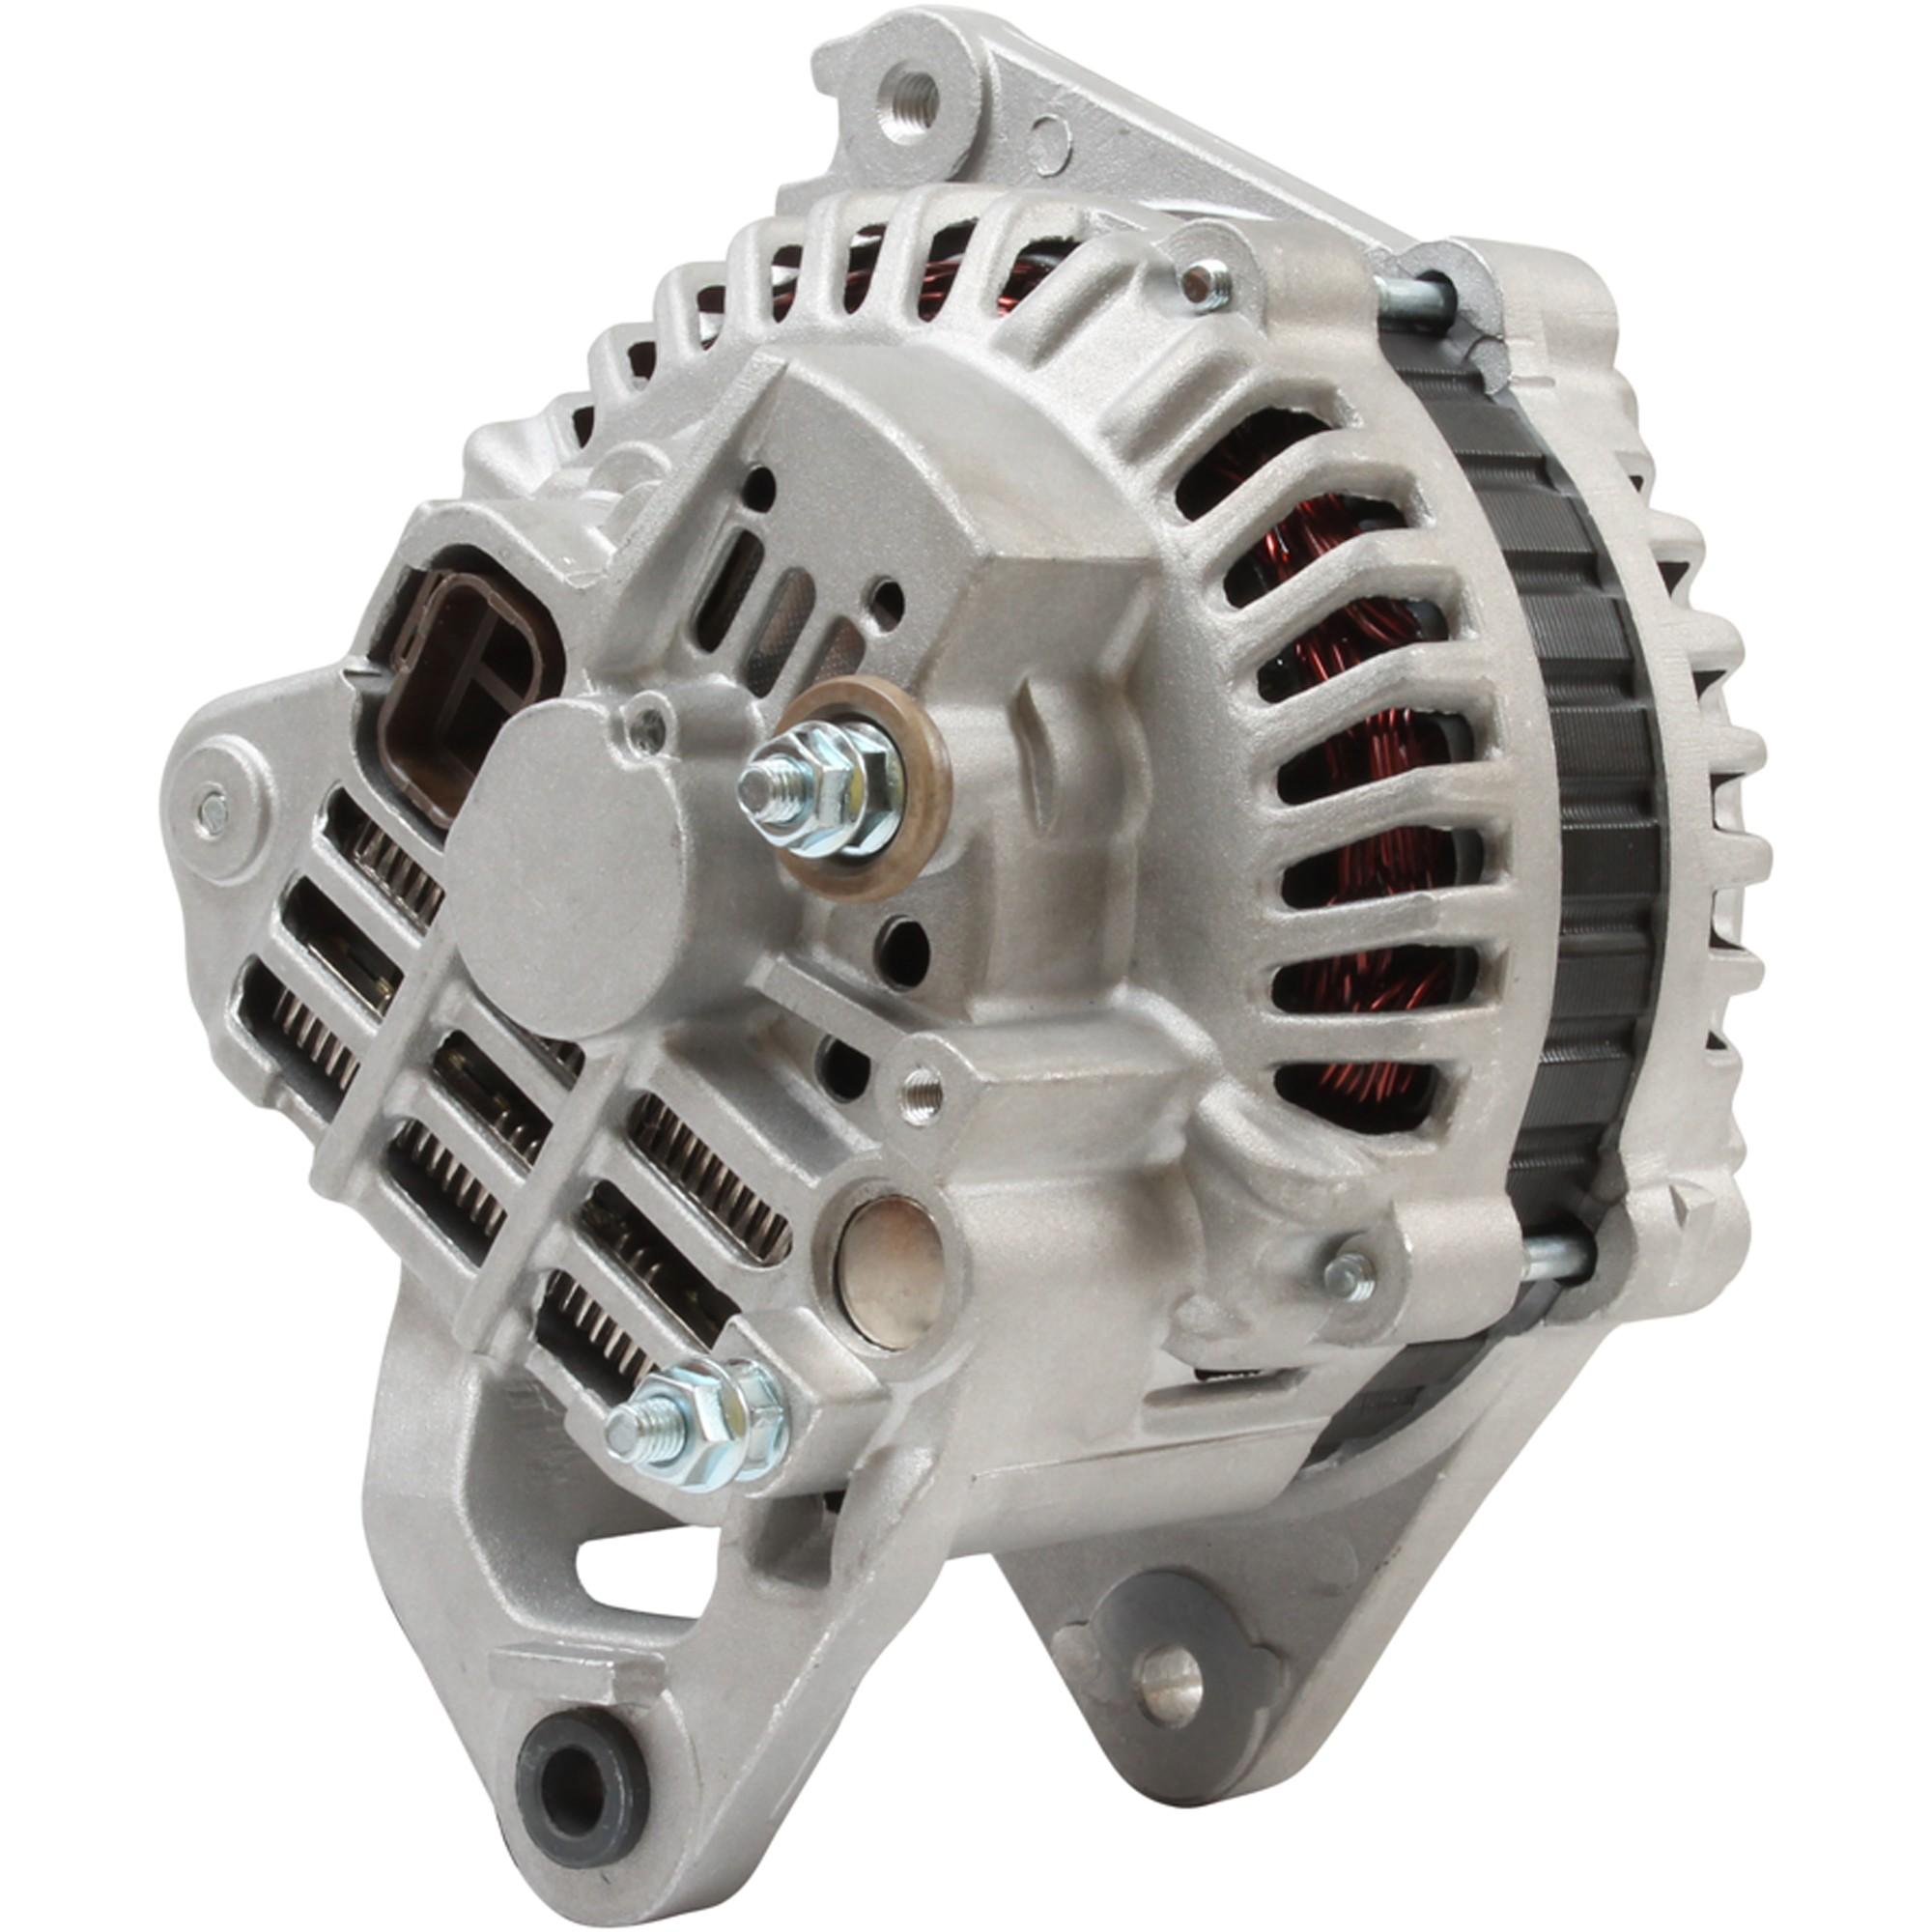 ispacegoa.com Parts & Accessories Automotive NEW ALTERNATOR FOR ...